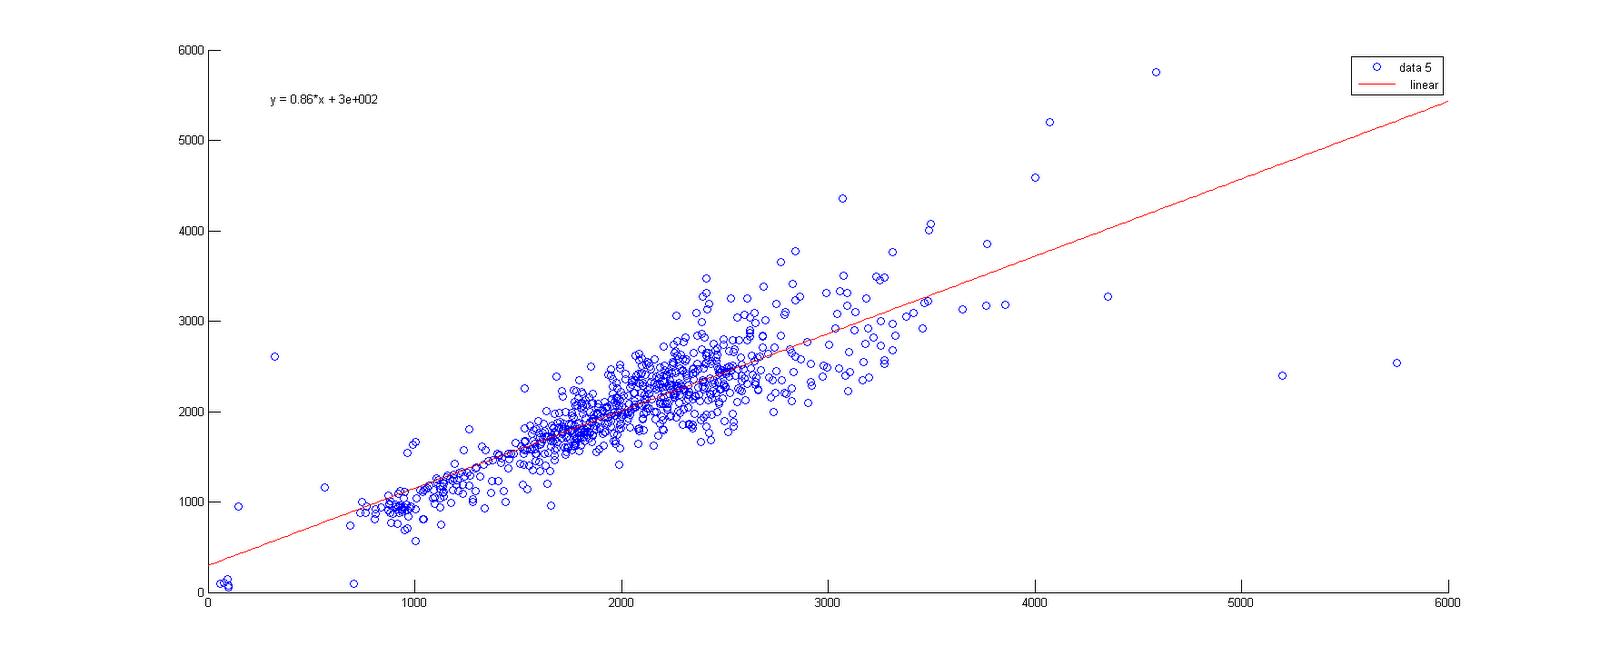 Matlab: Scatter Plot for AR(1) | Time Series Analysis